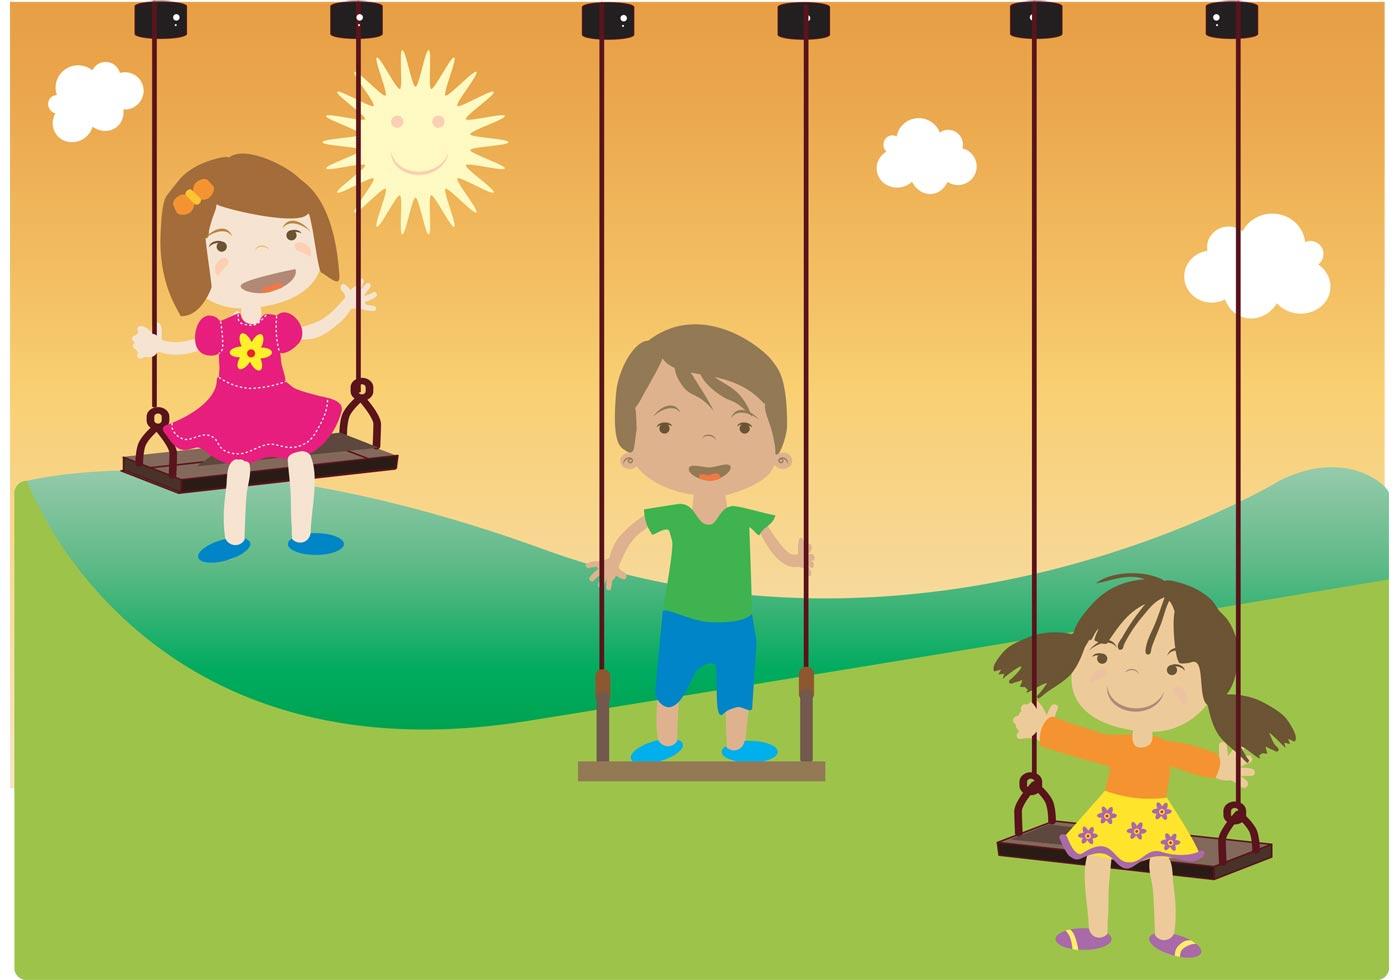 Kids Free Vector Art - (11049 Free Downloads)